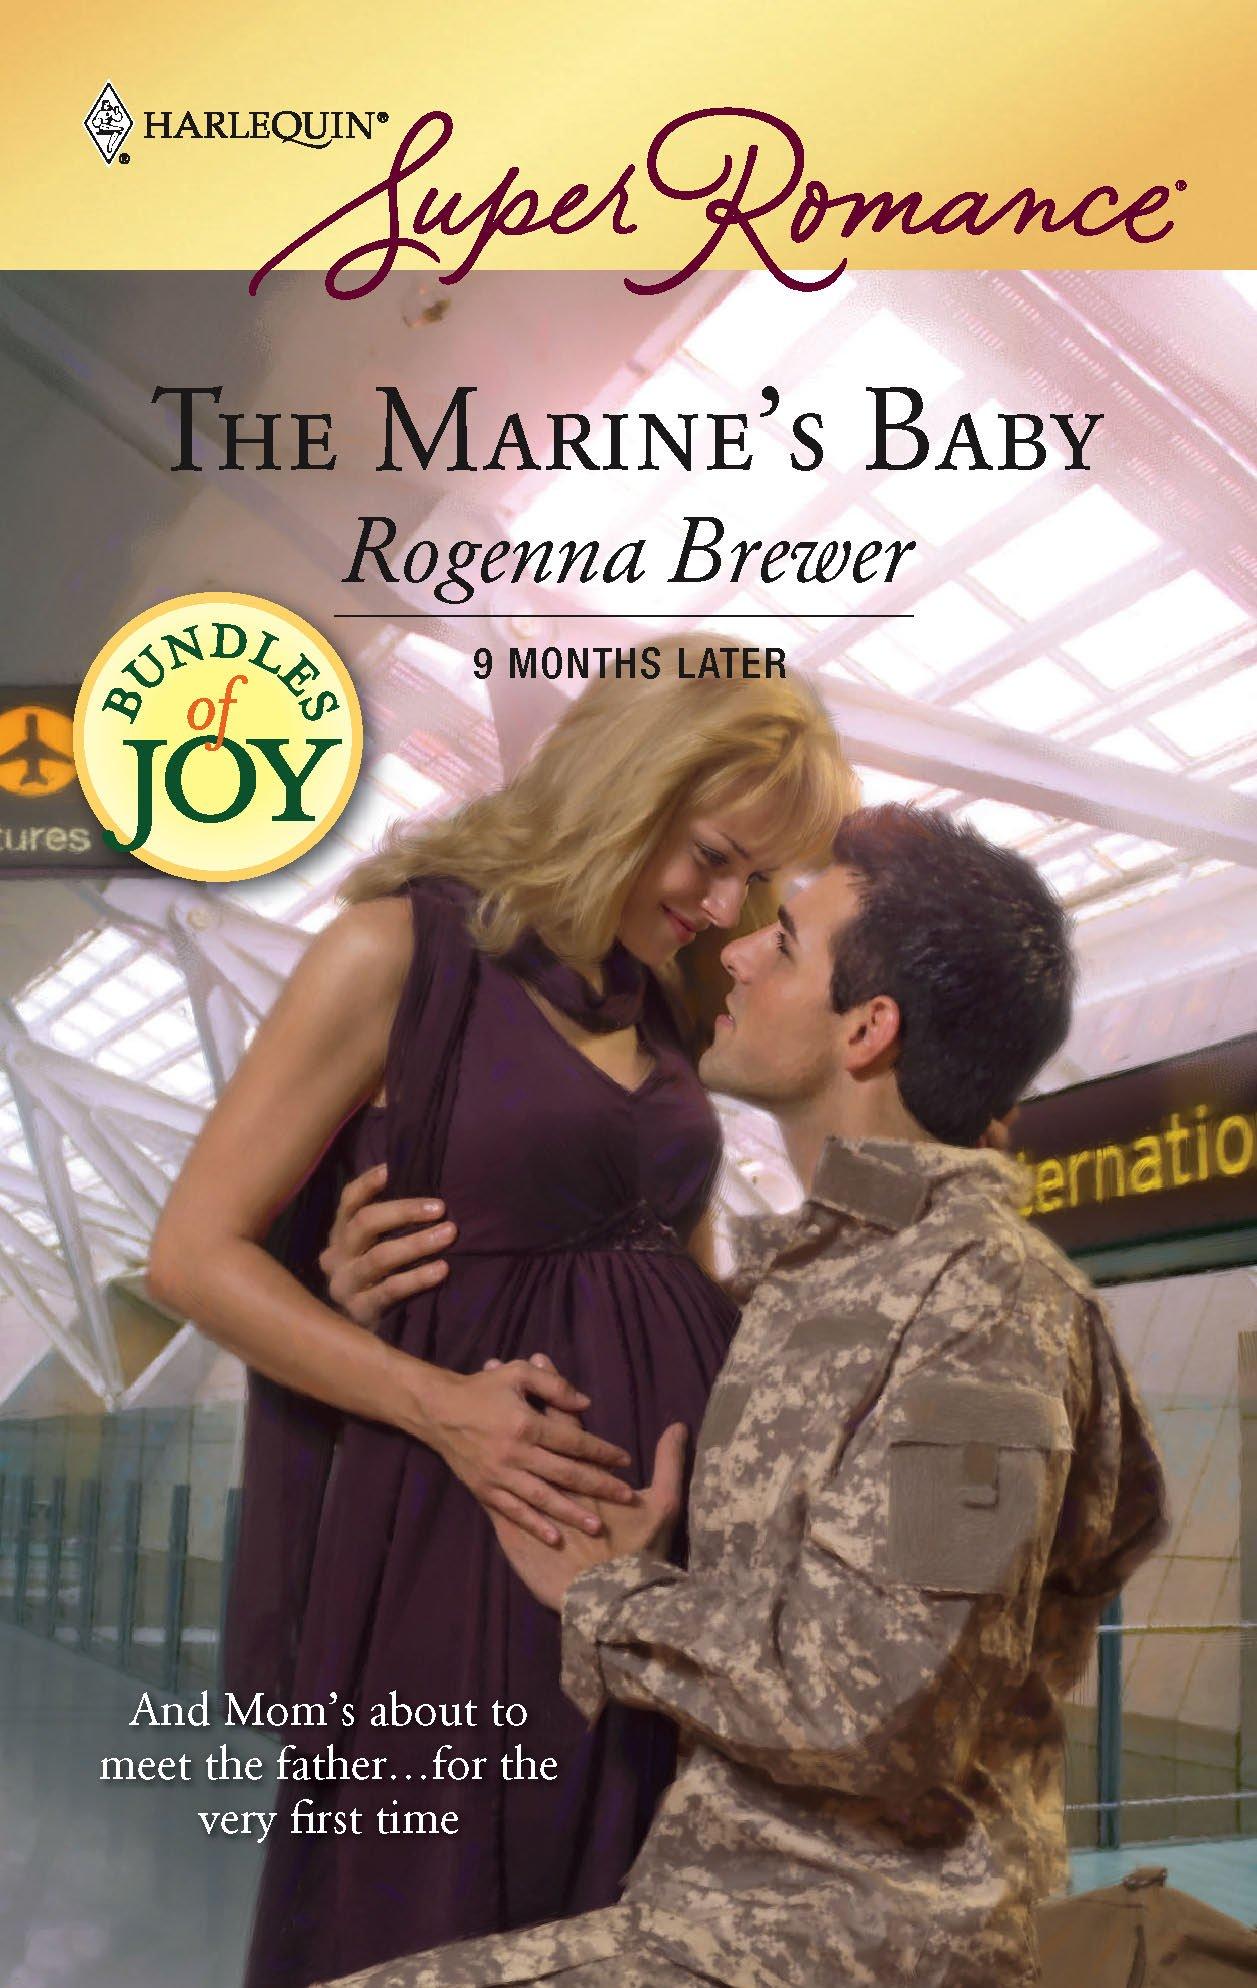 Read Online The Marine's Baby (Harlequin Superromance, No. 1478 / 9 Months Later / Bundles of Joy) pdf